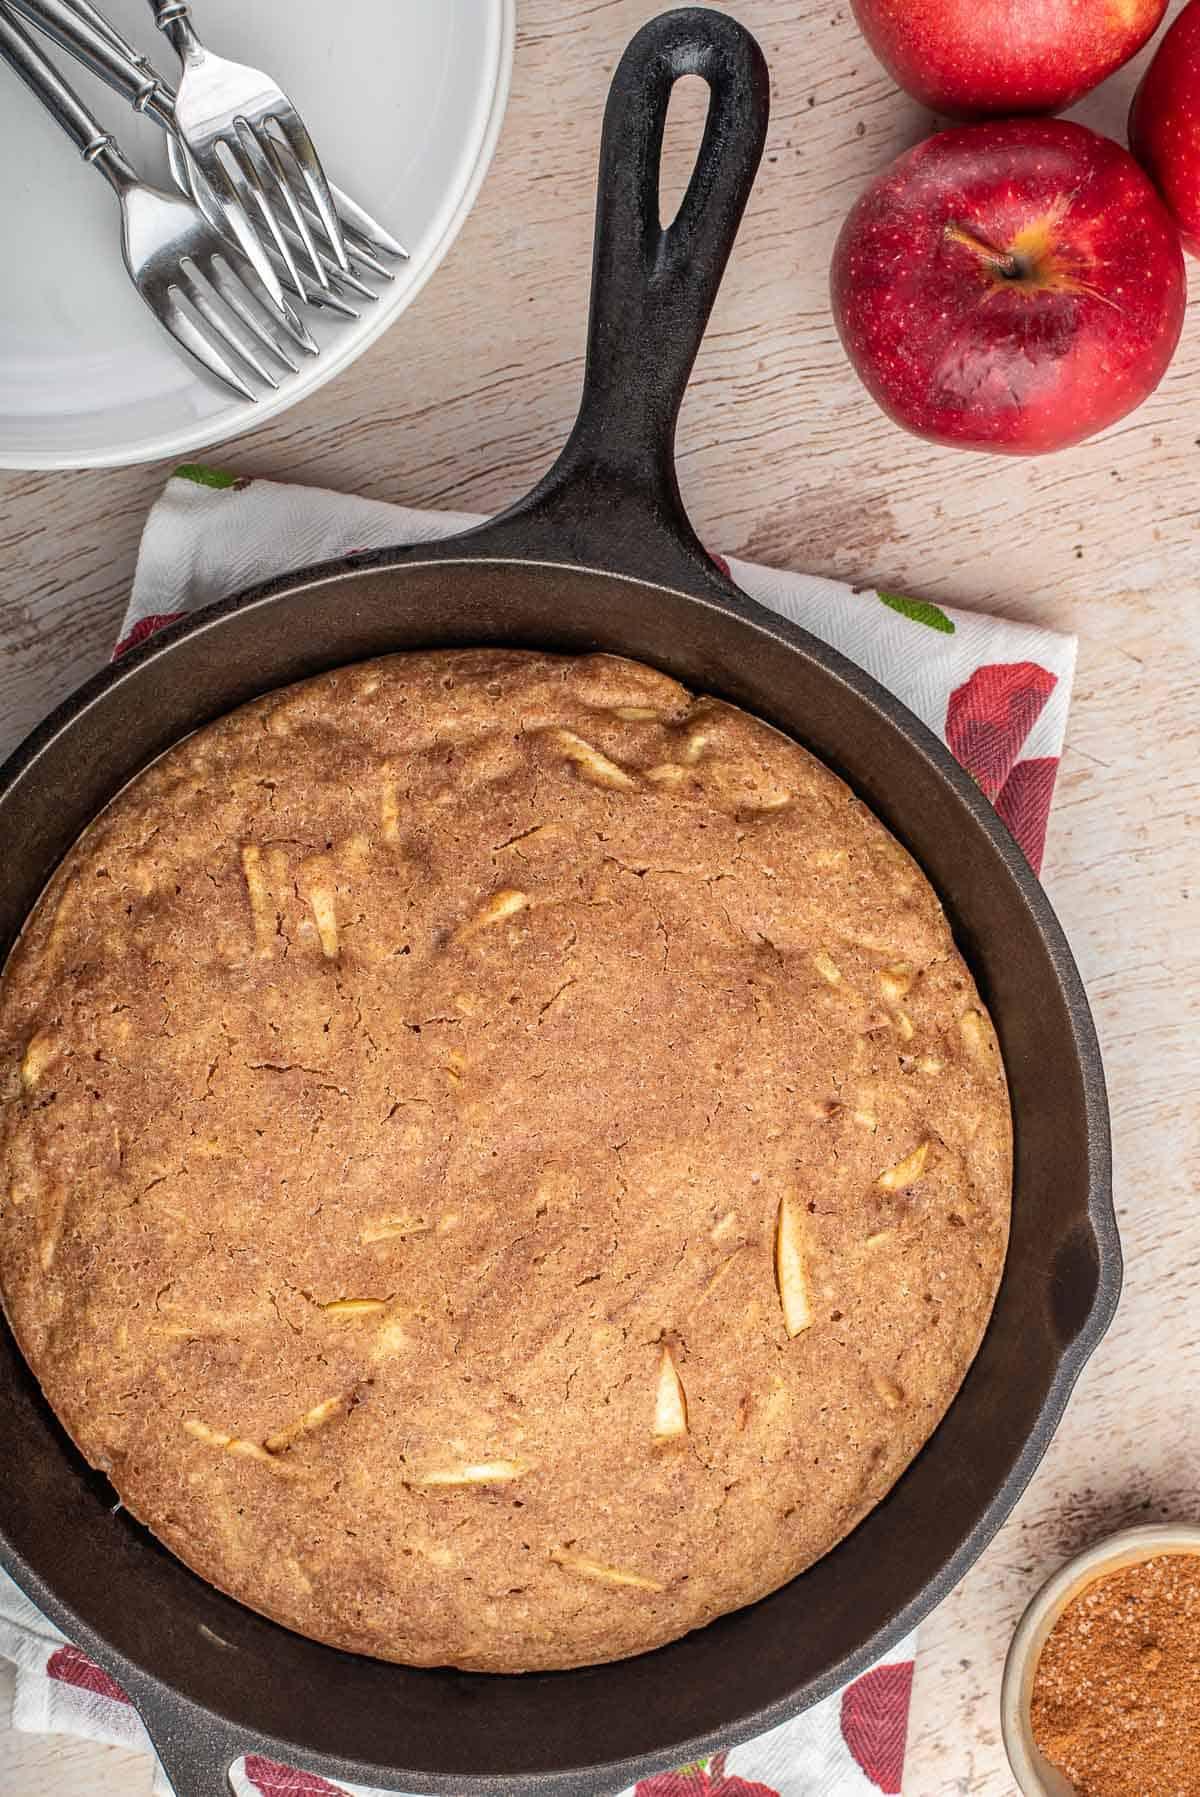 Overhead view of apple pancake in a black skillet.